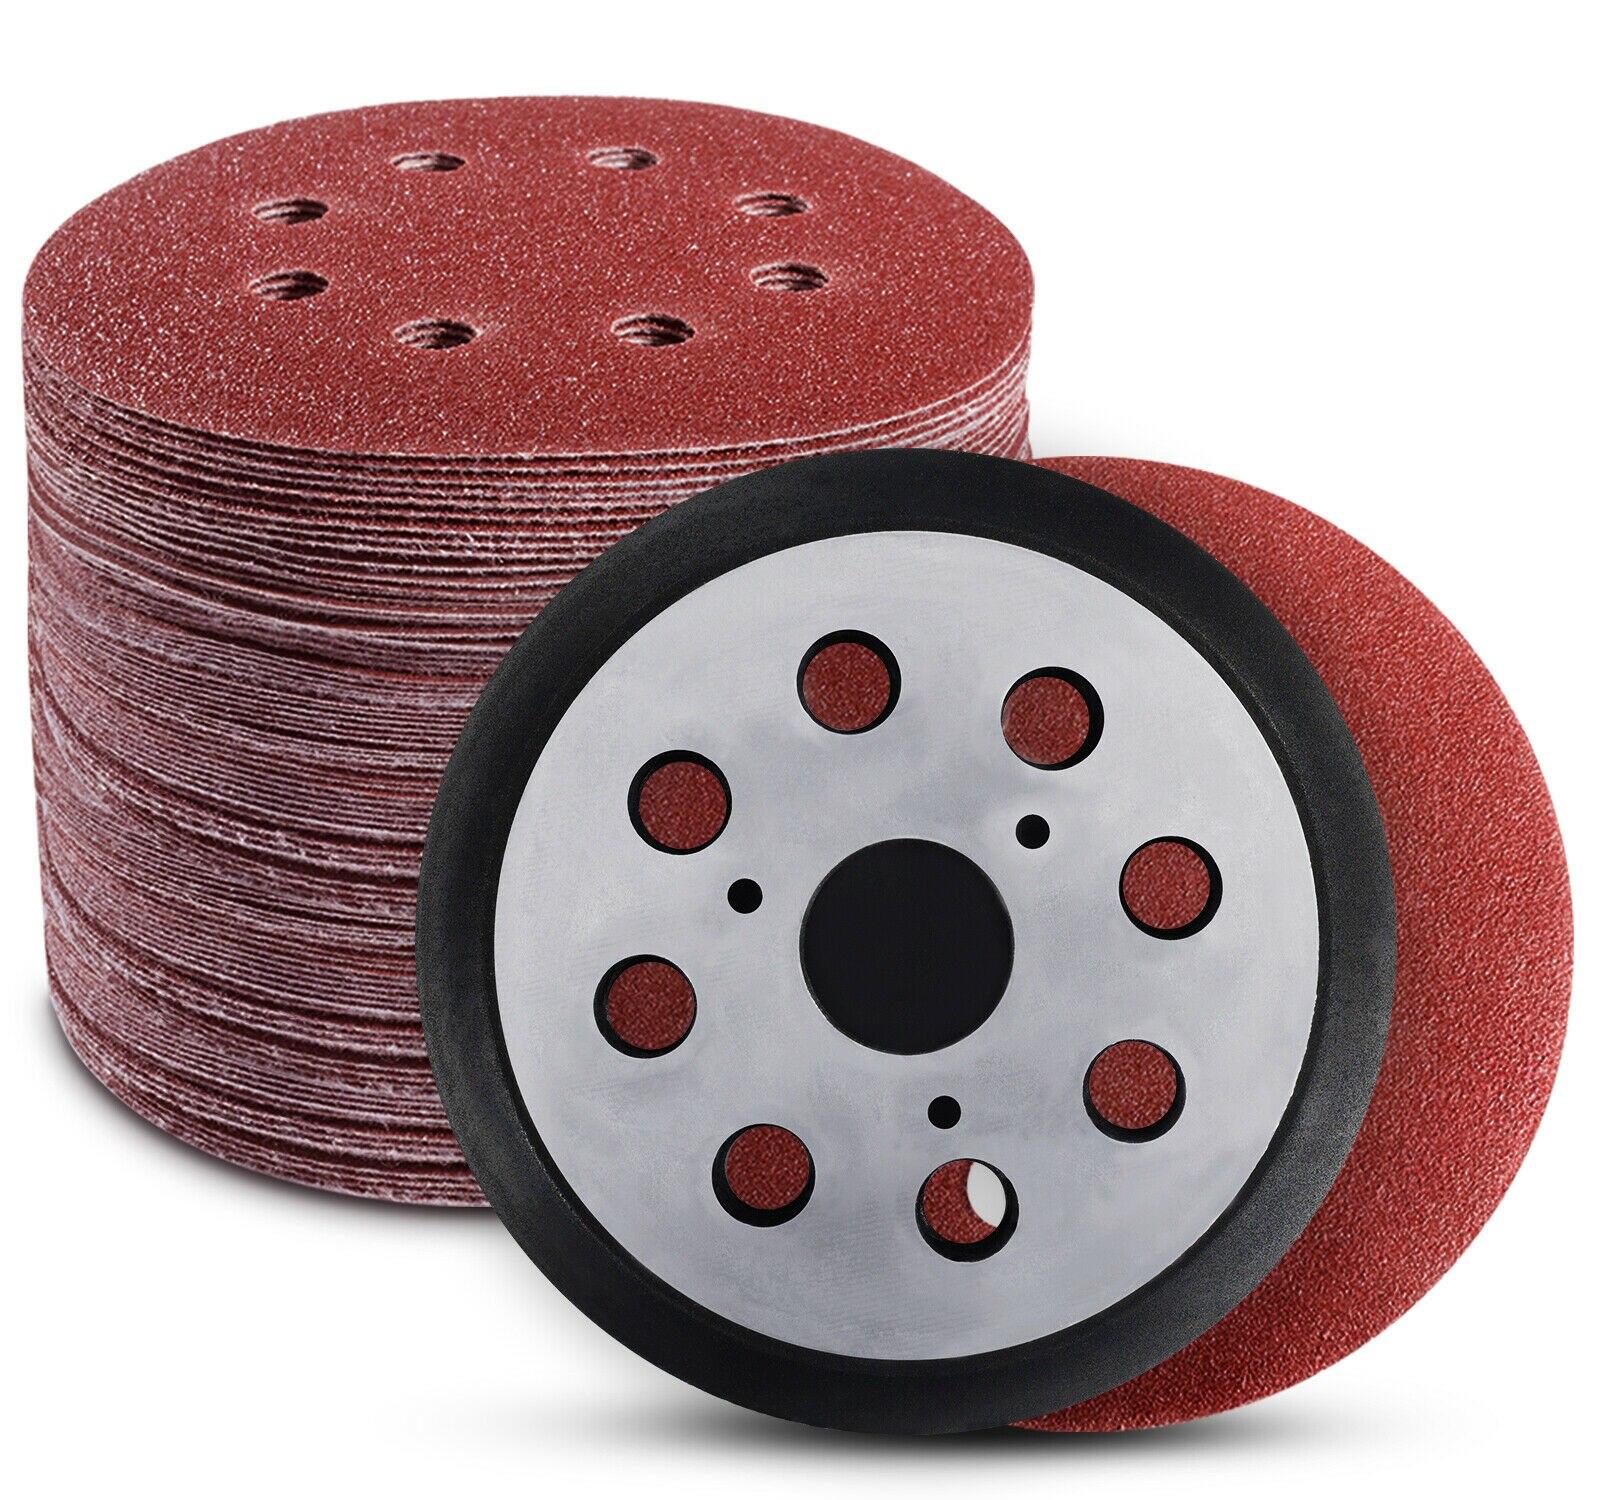 70PCS 5 Inch Hook and Loop Sanding Discs 8 Holes with 1PCS Sander Polishing Pad